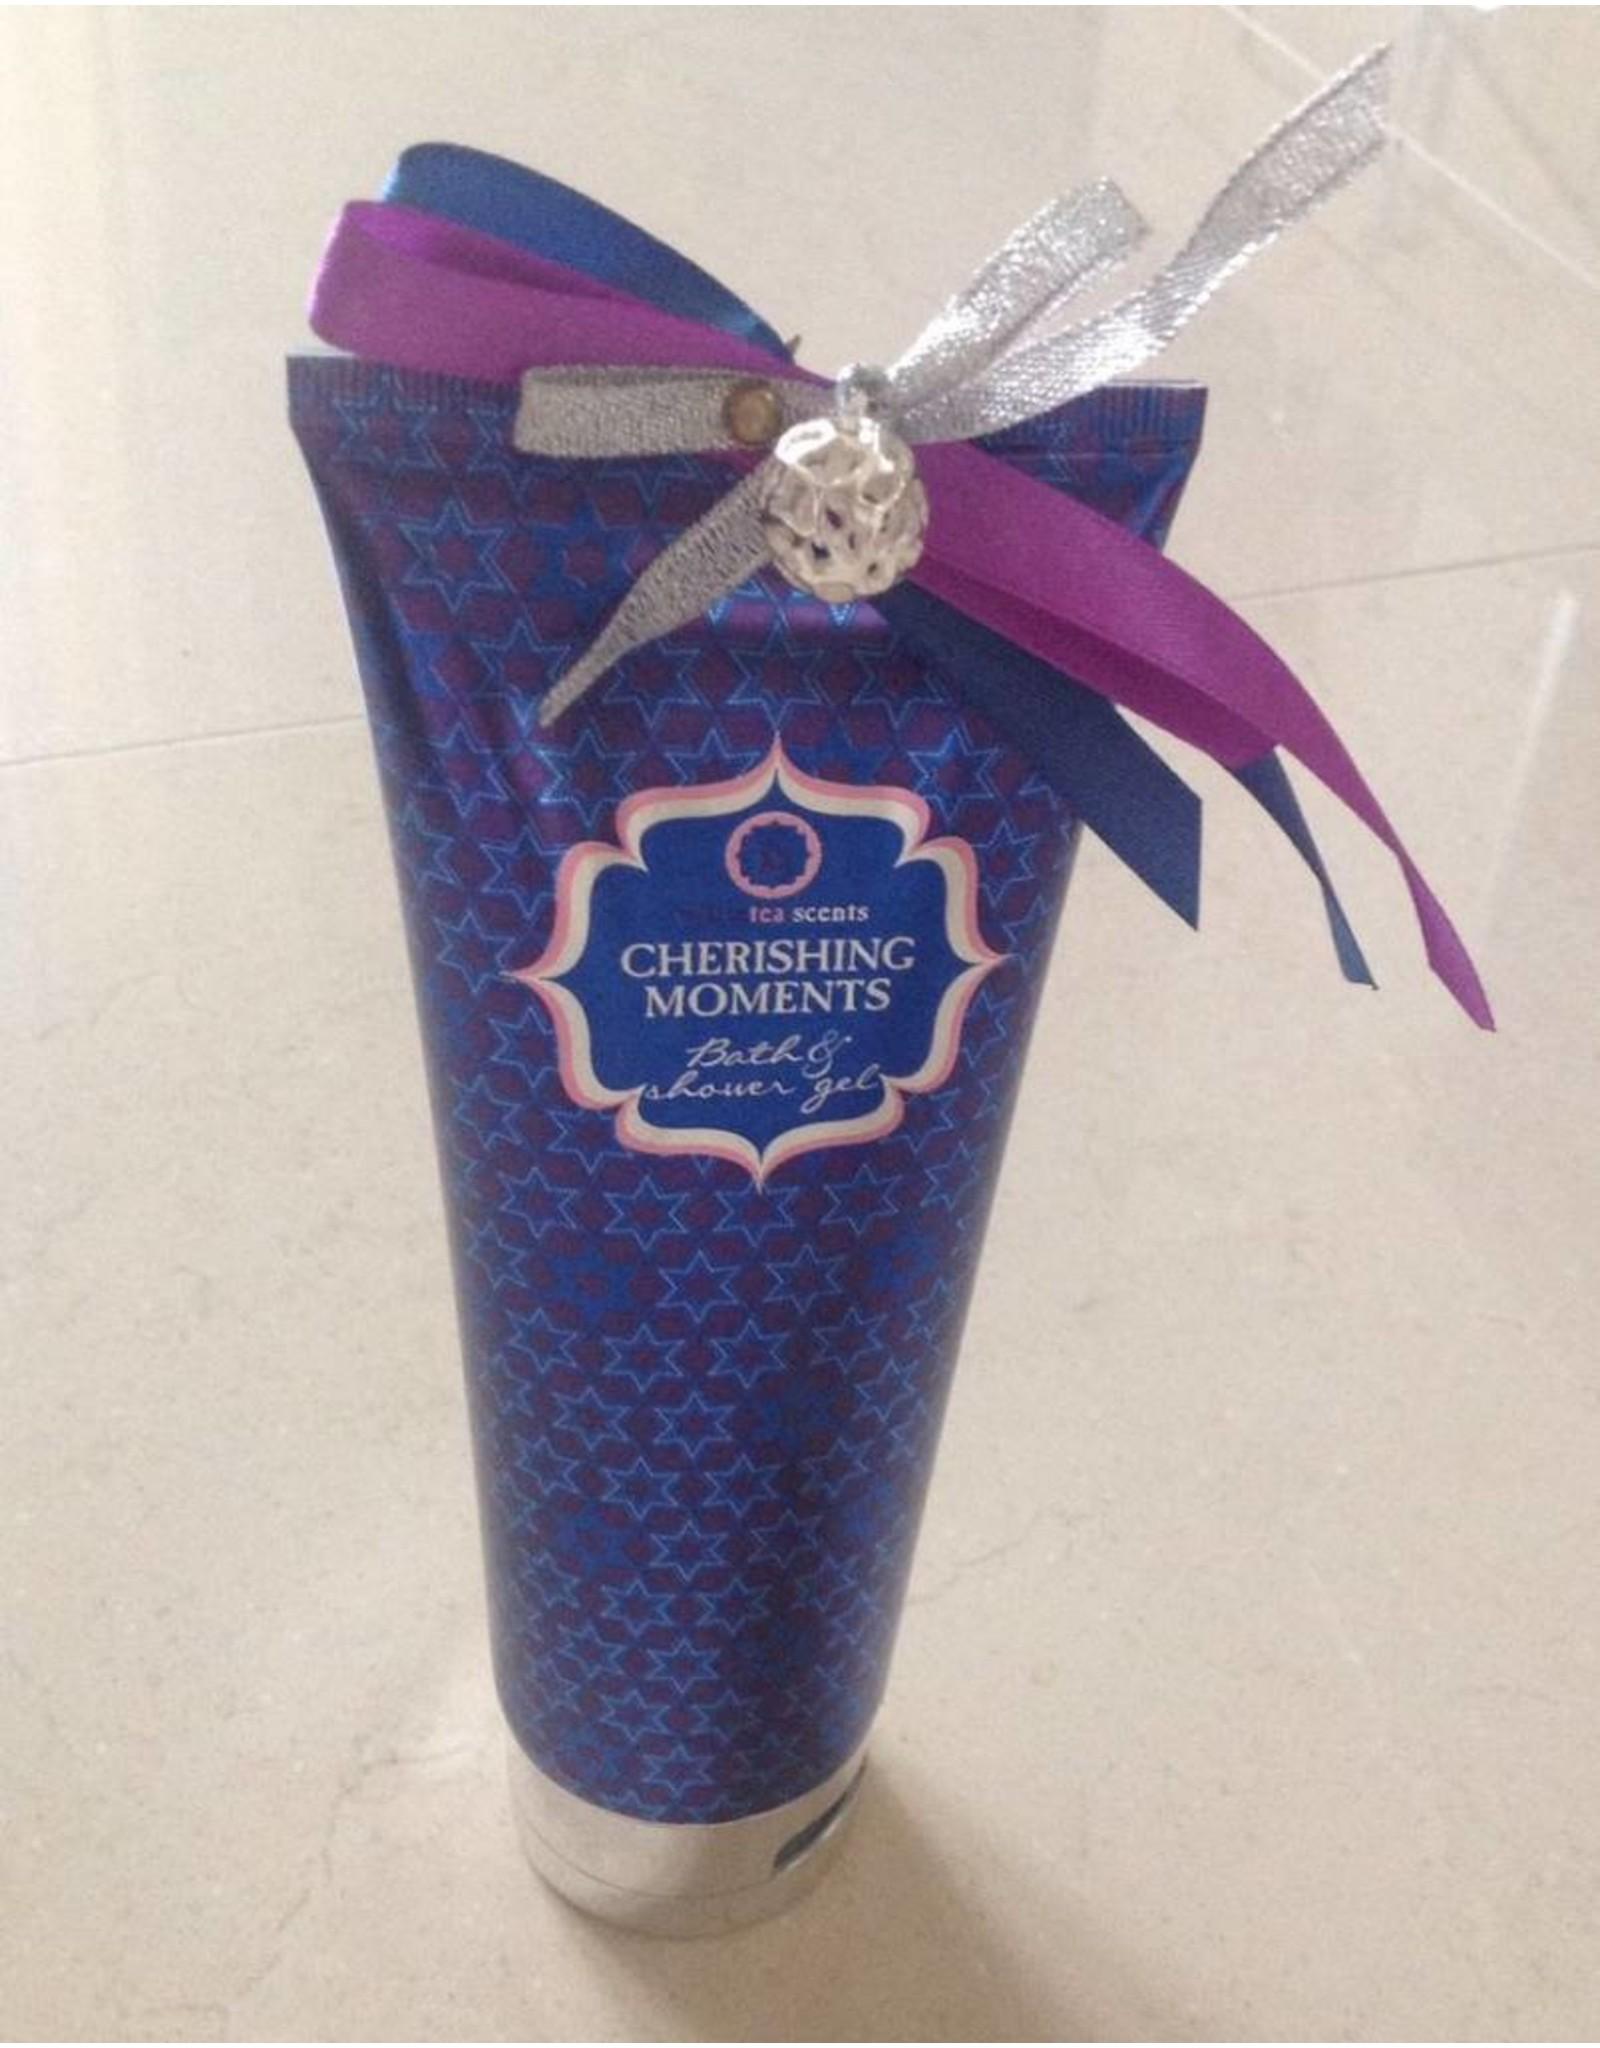 Cherishing Moments Showergel 250 ml - Body & Soap